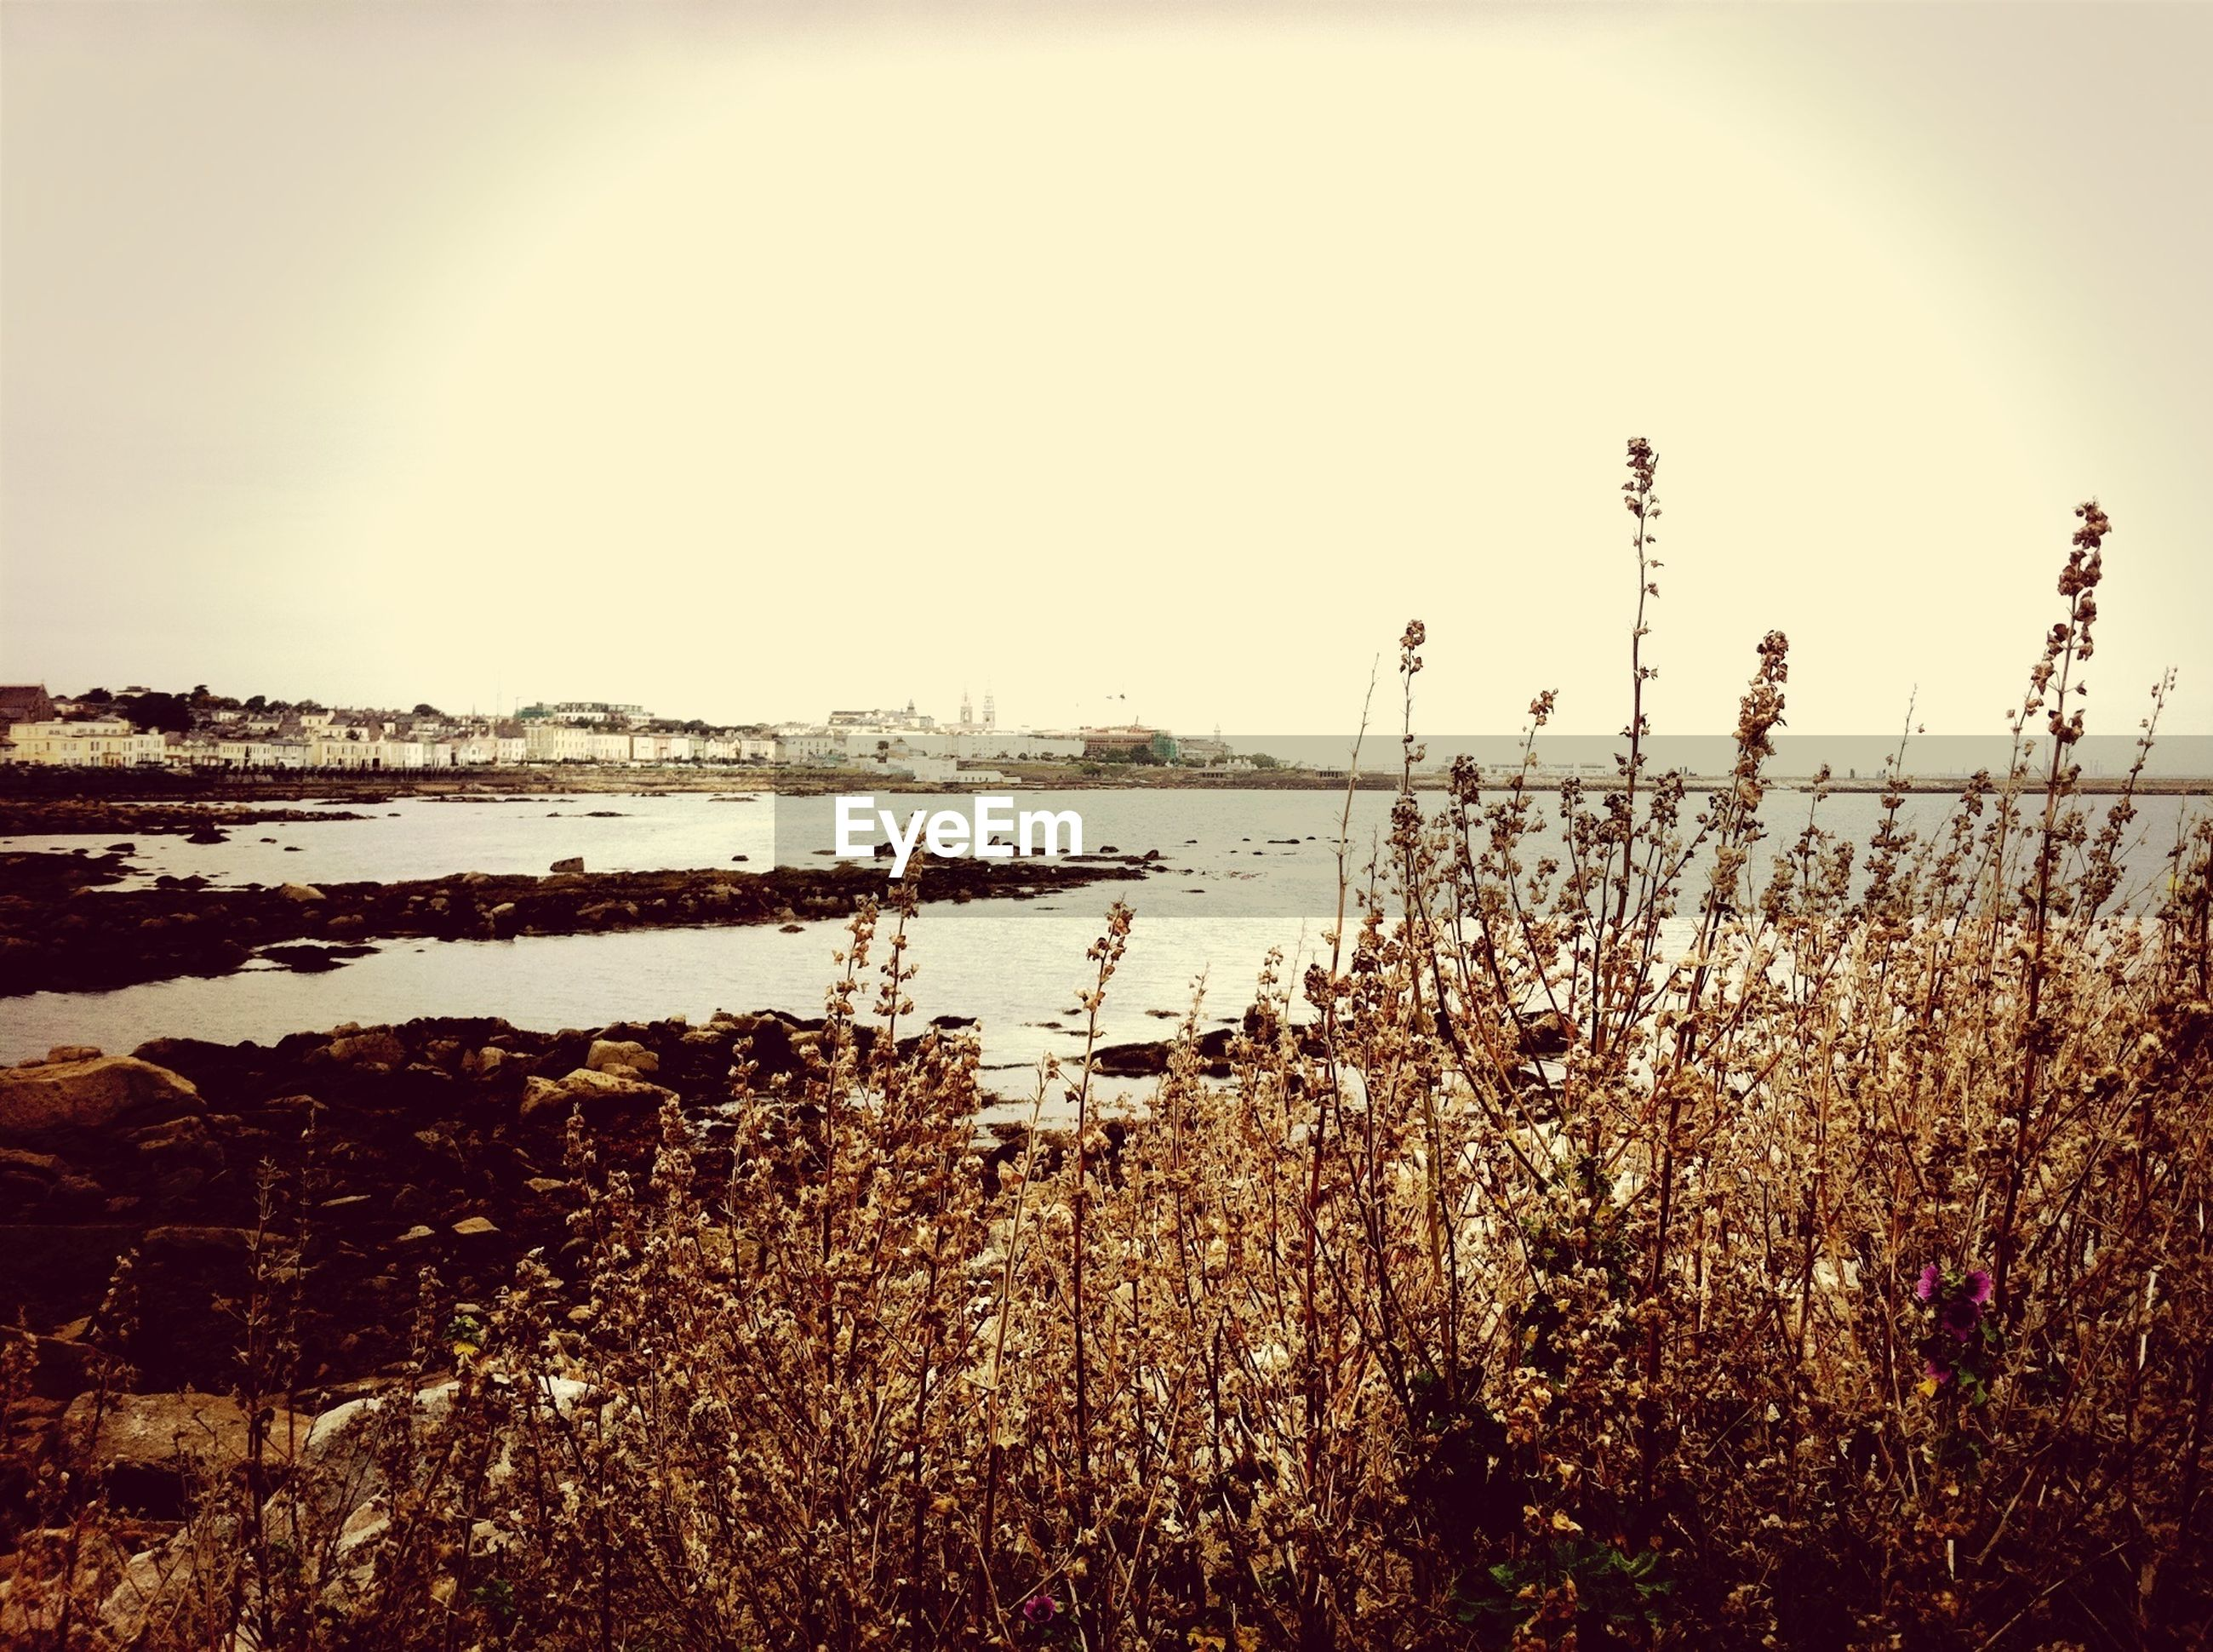 Dry plants on lakeshore